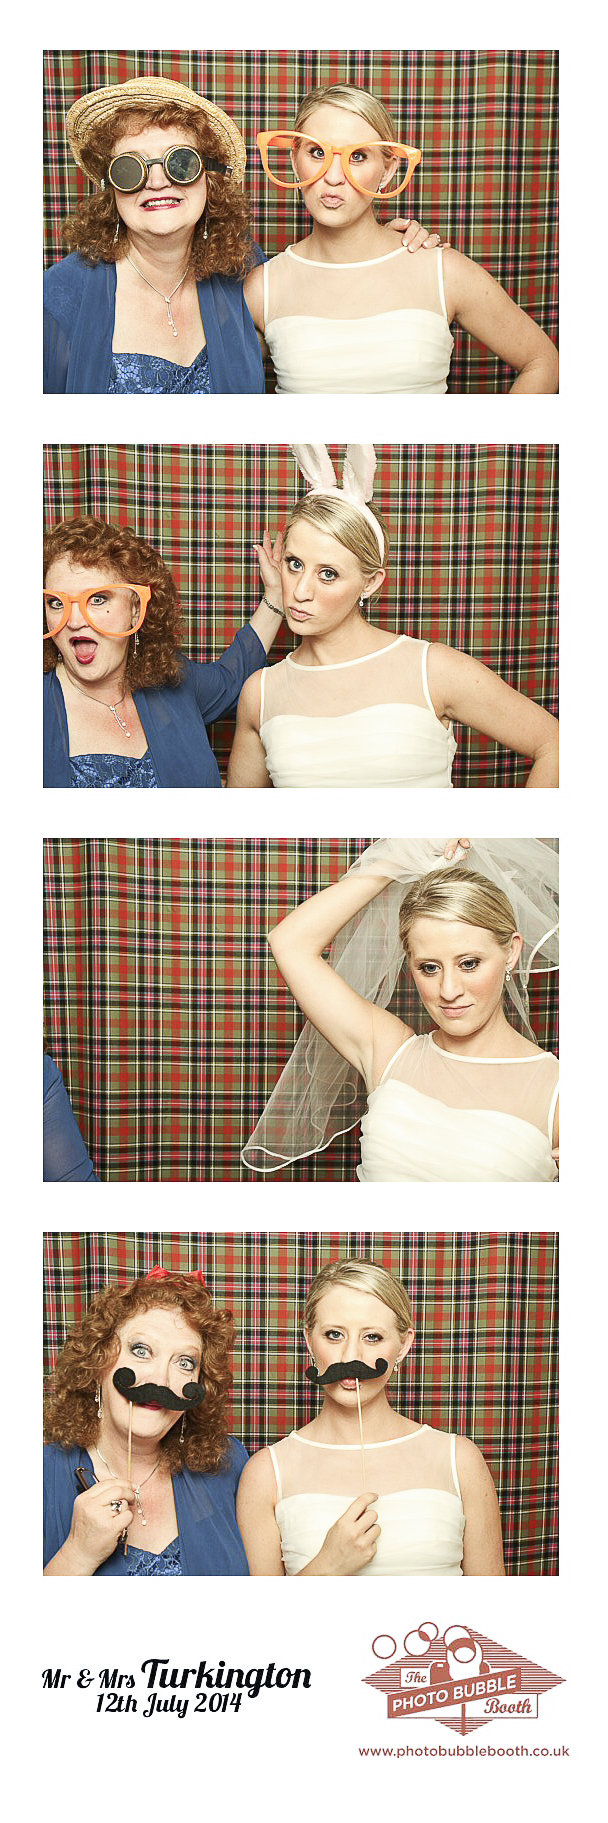 Mr & Mrs Turkington Photobooth _13.JPG